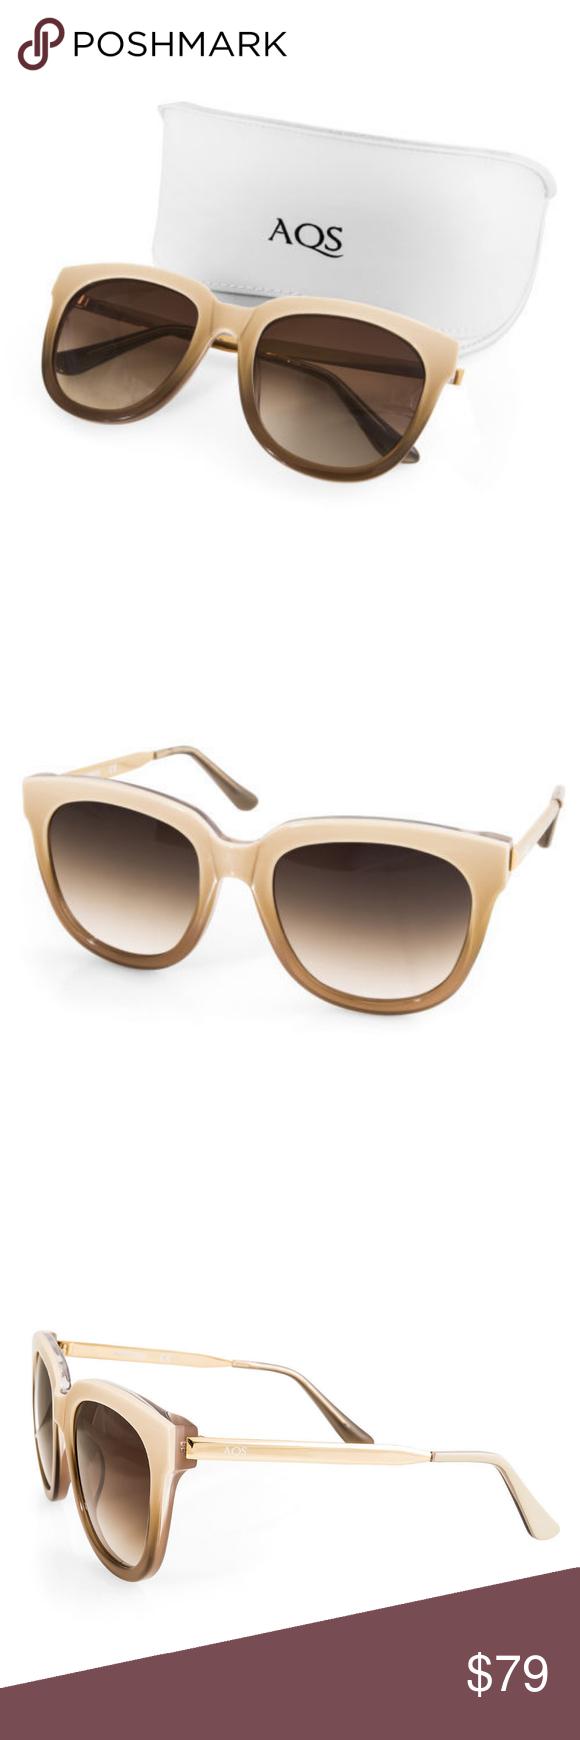 c5290b96dfc2 AQS by Aquaswiss Piper 55mm Sunglasses Beige Gold